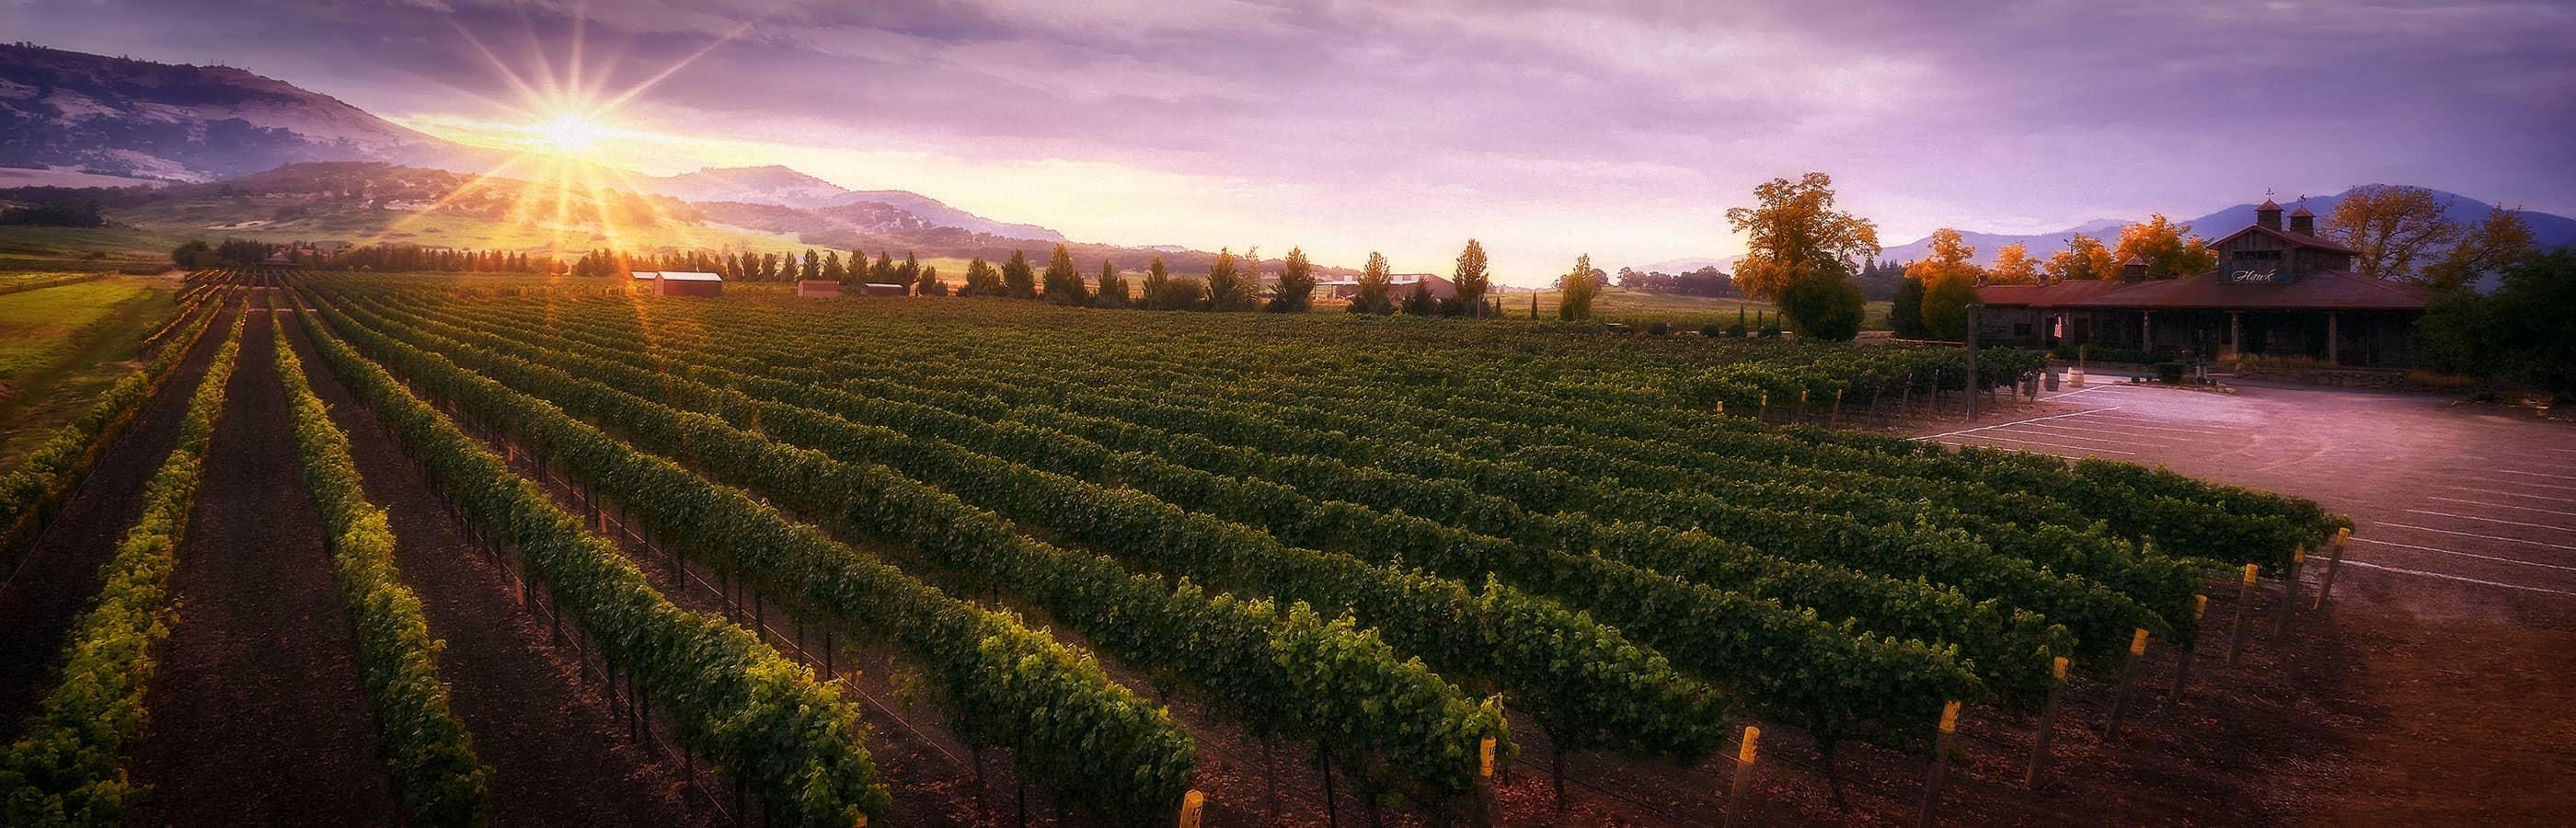 2Hawk Vineyard and Winery Building and Vineyard at Sunset